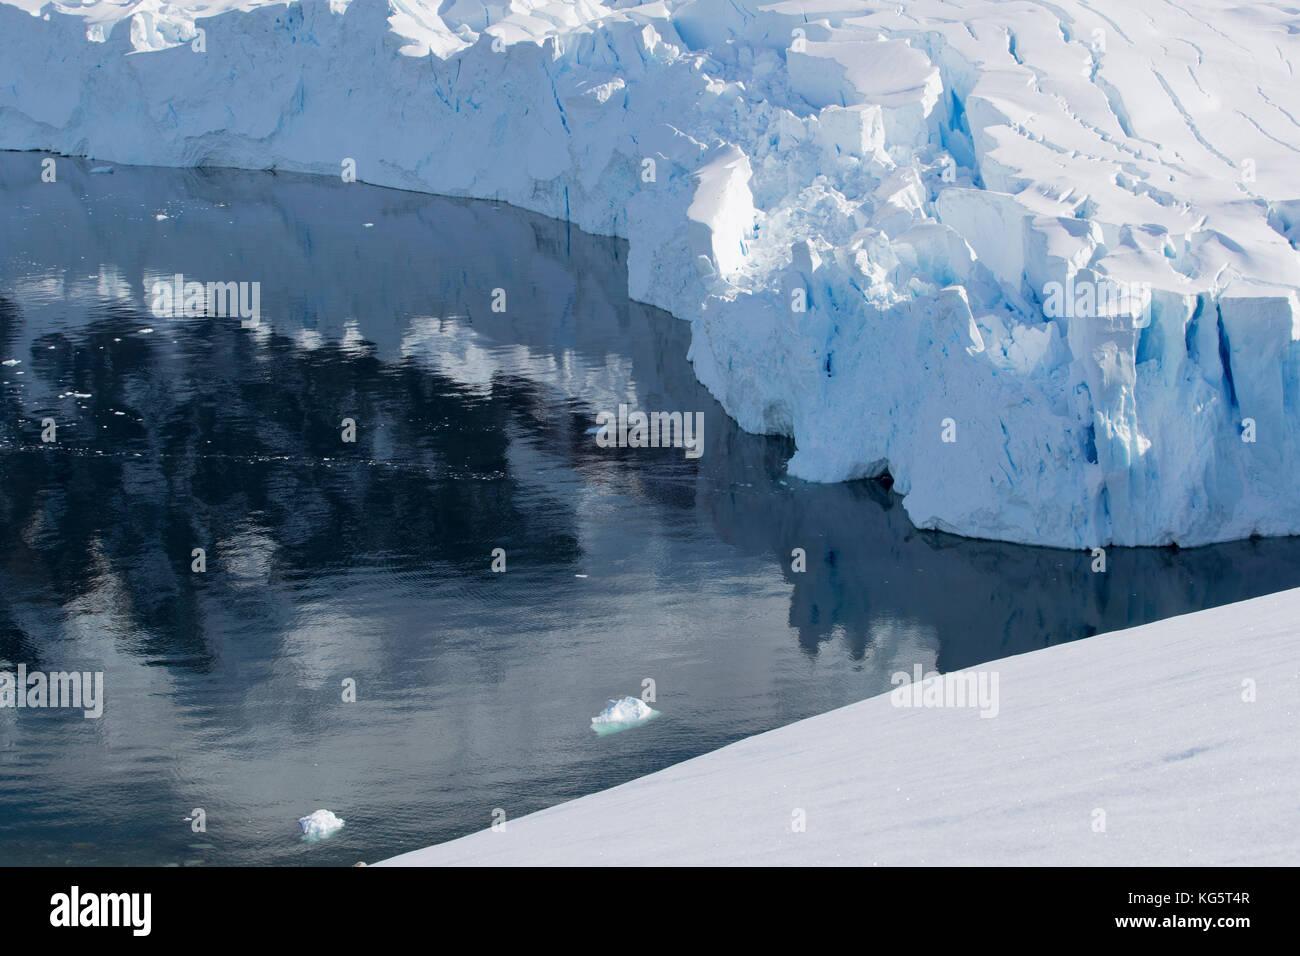 Glacier and water reflections, Antarctic Peninsular - Stock Image